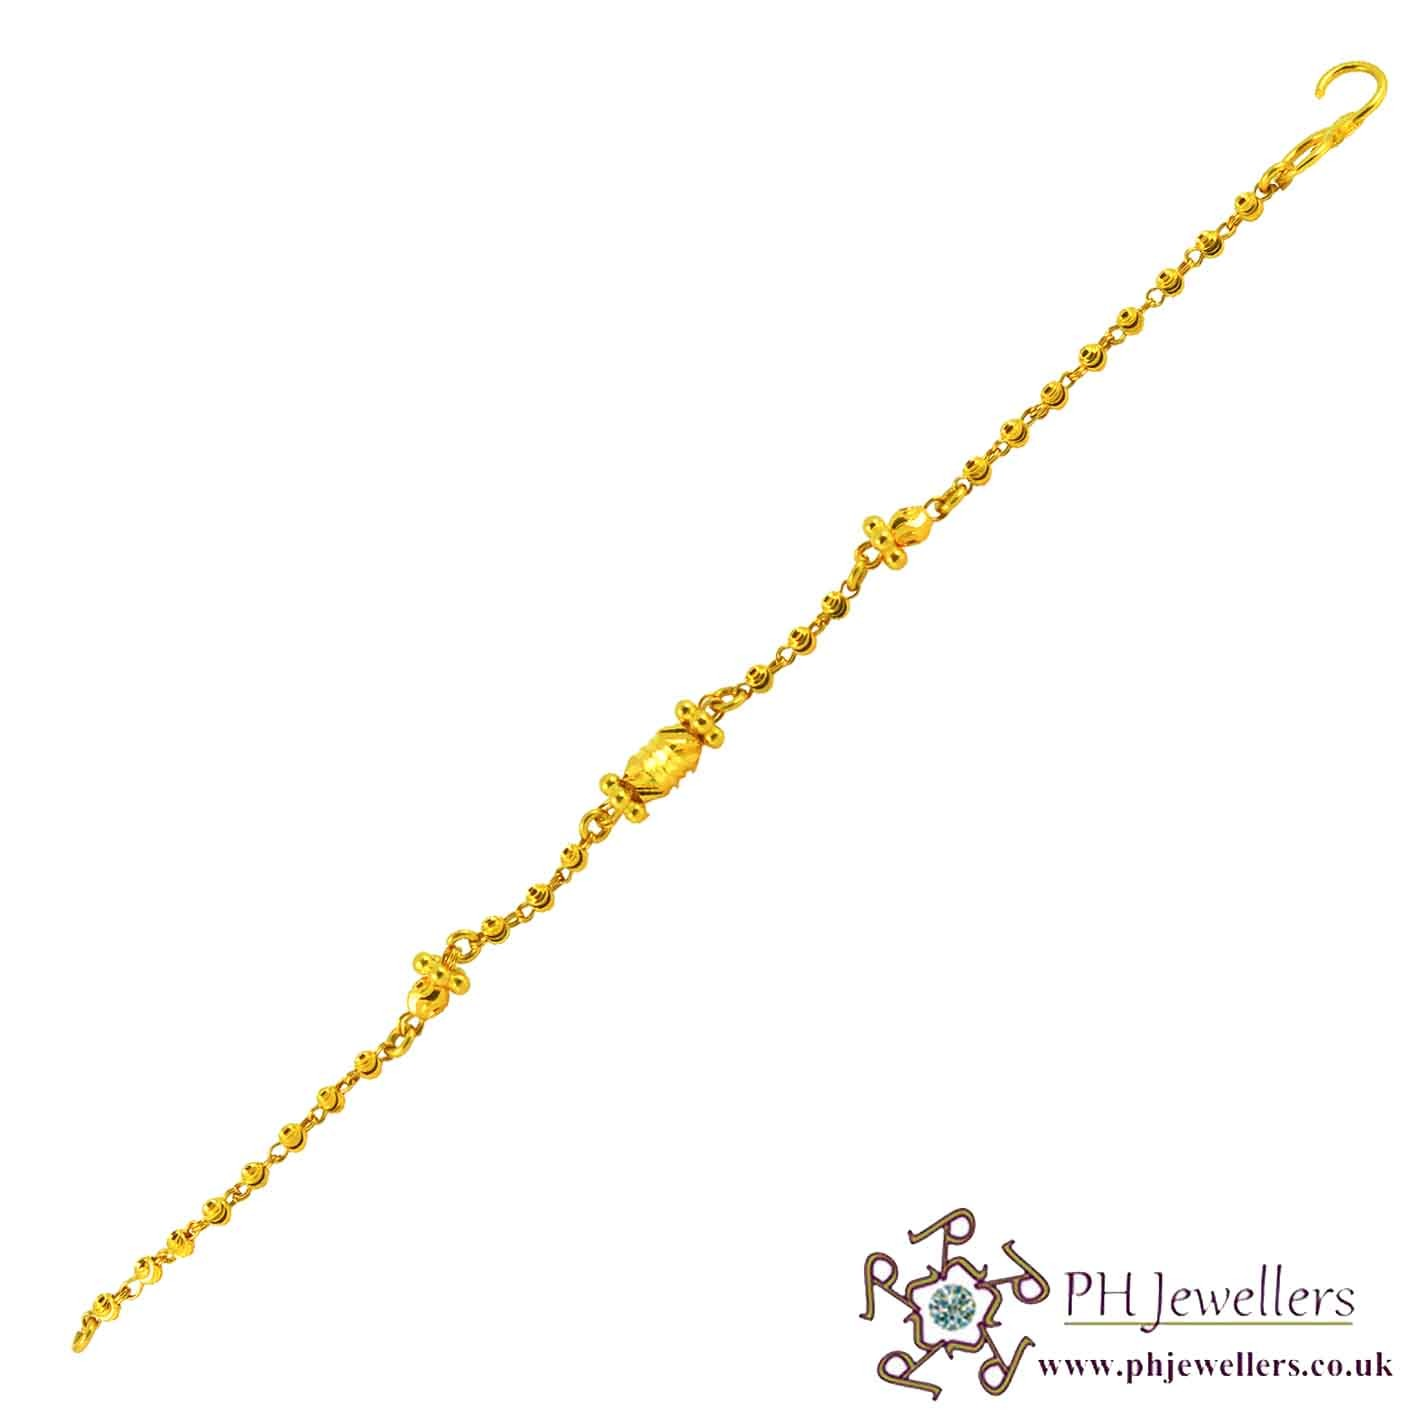 22ct 916 Hallmark Yellow Gold Mania Bracelet KB7